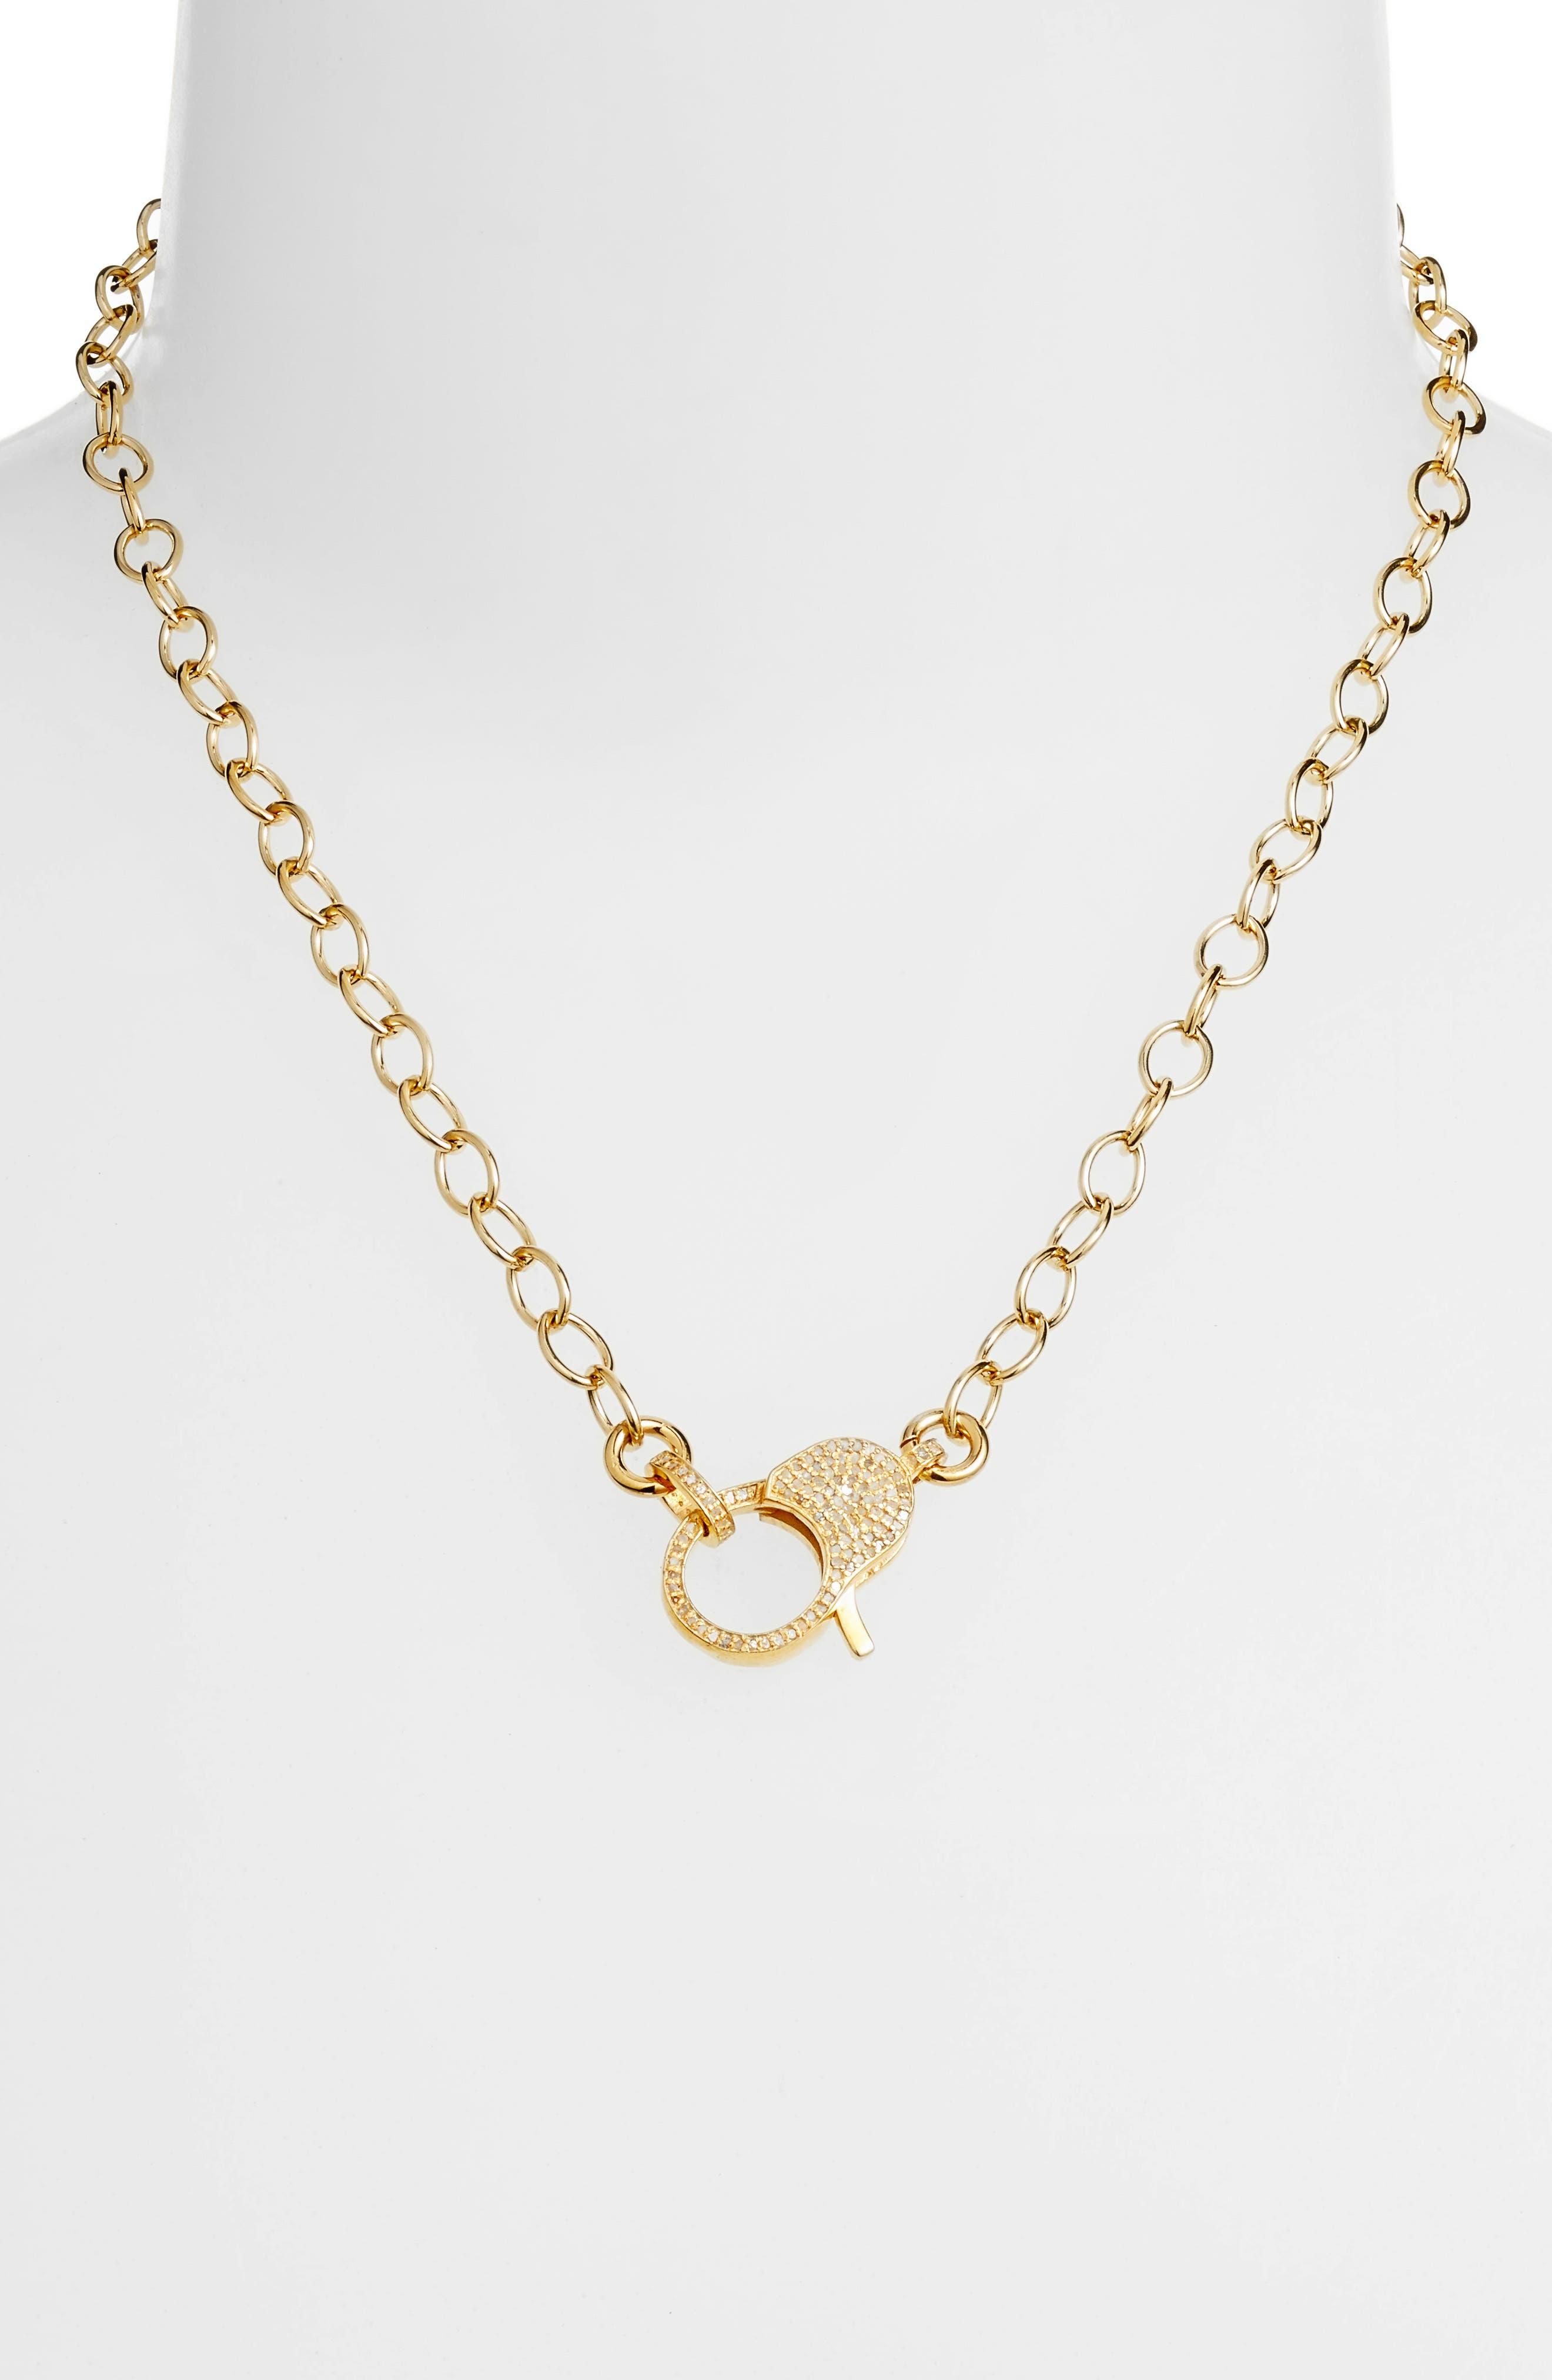 Jane Basch Pavé Lock Chain Necklace,                             Alternate thumbnail 2, color,                             Gold